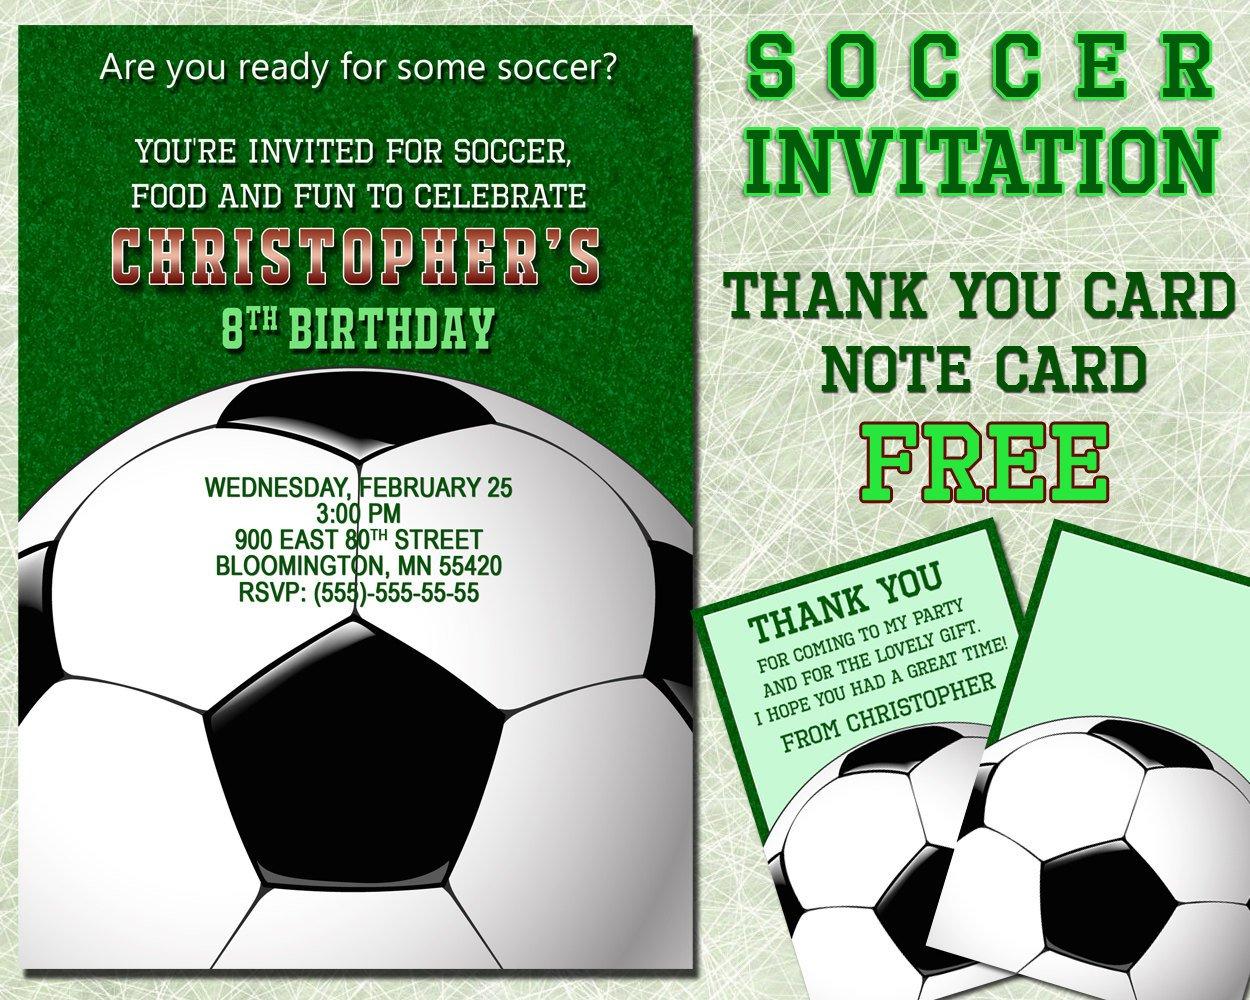 Soccer Invitation For Boys Birthday Party Printable Invite | Etsy - Free Printable Soccer Thank You Cards